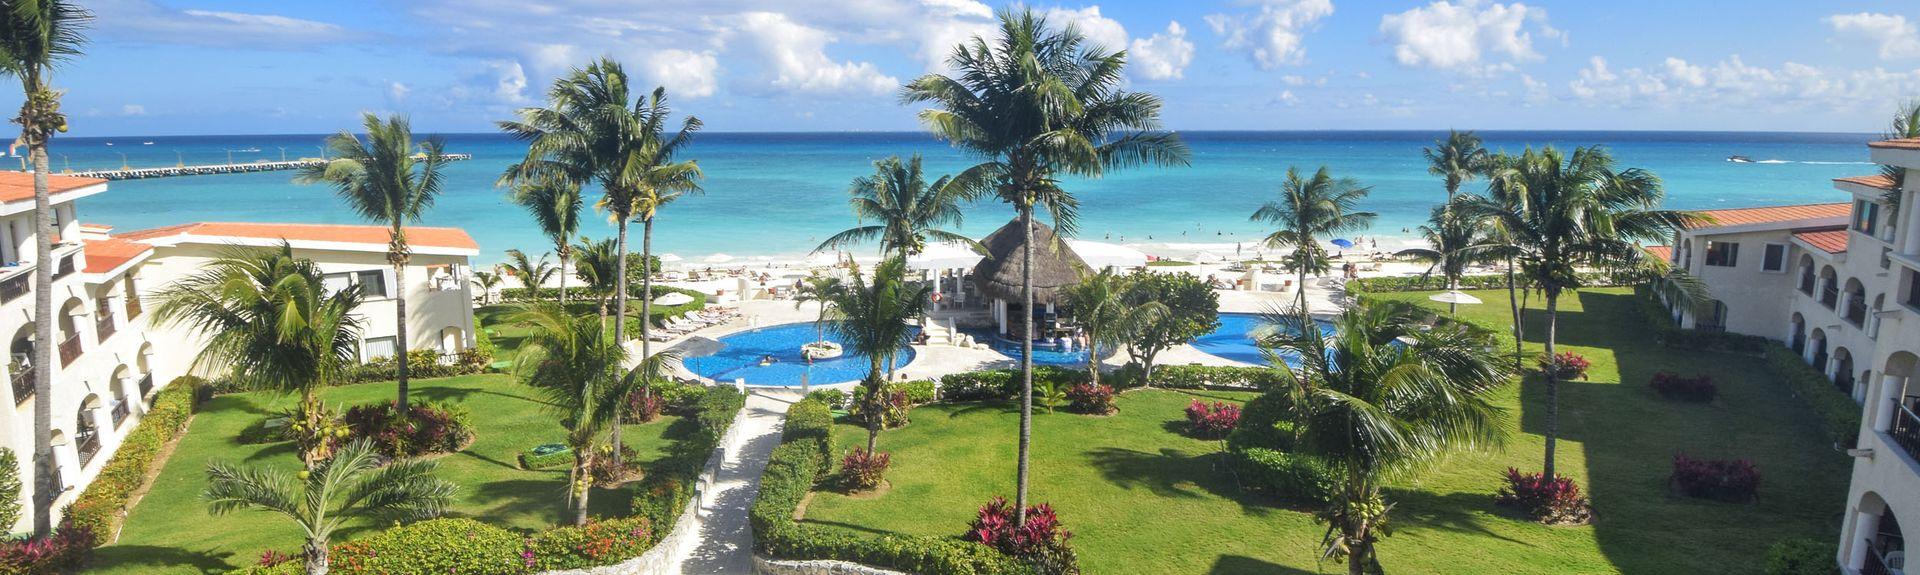 Xaman Ha (Playa del Carmen, Quintana Roo, México)